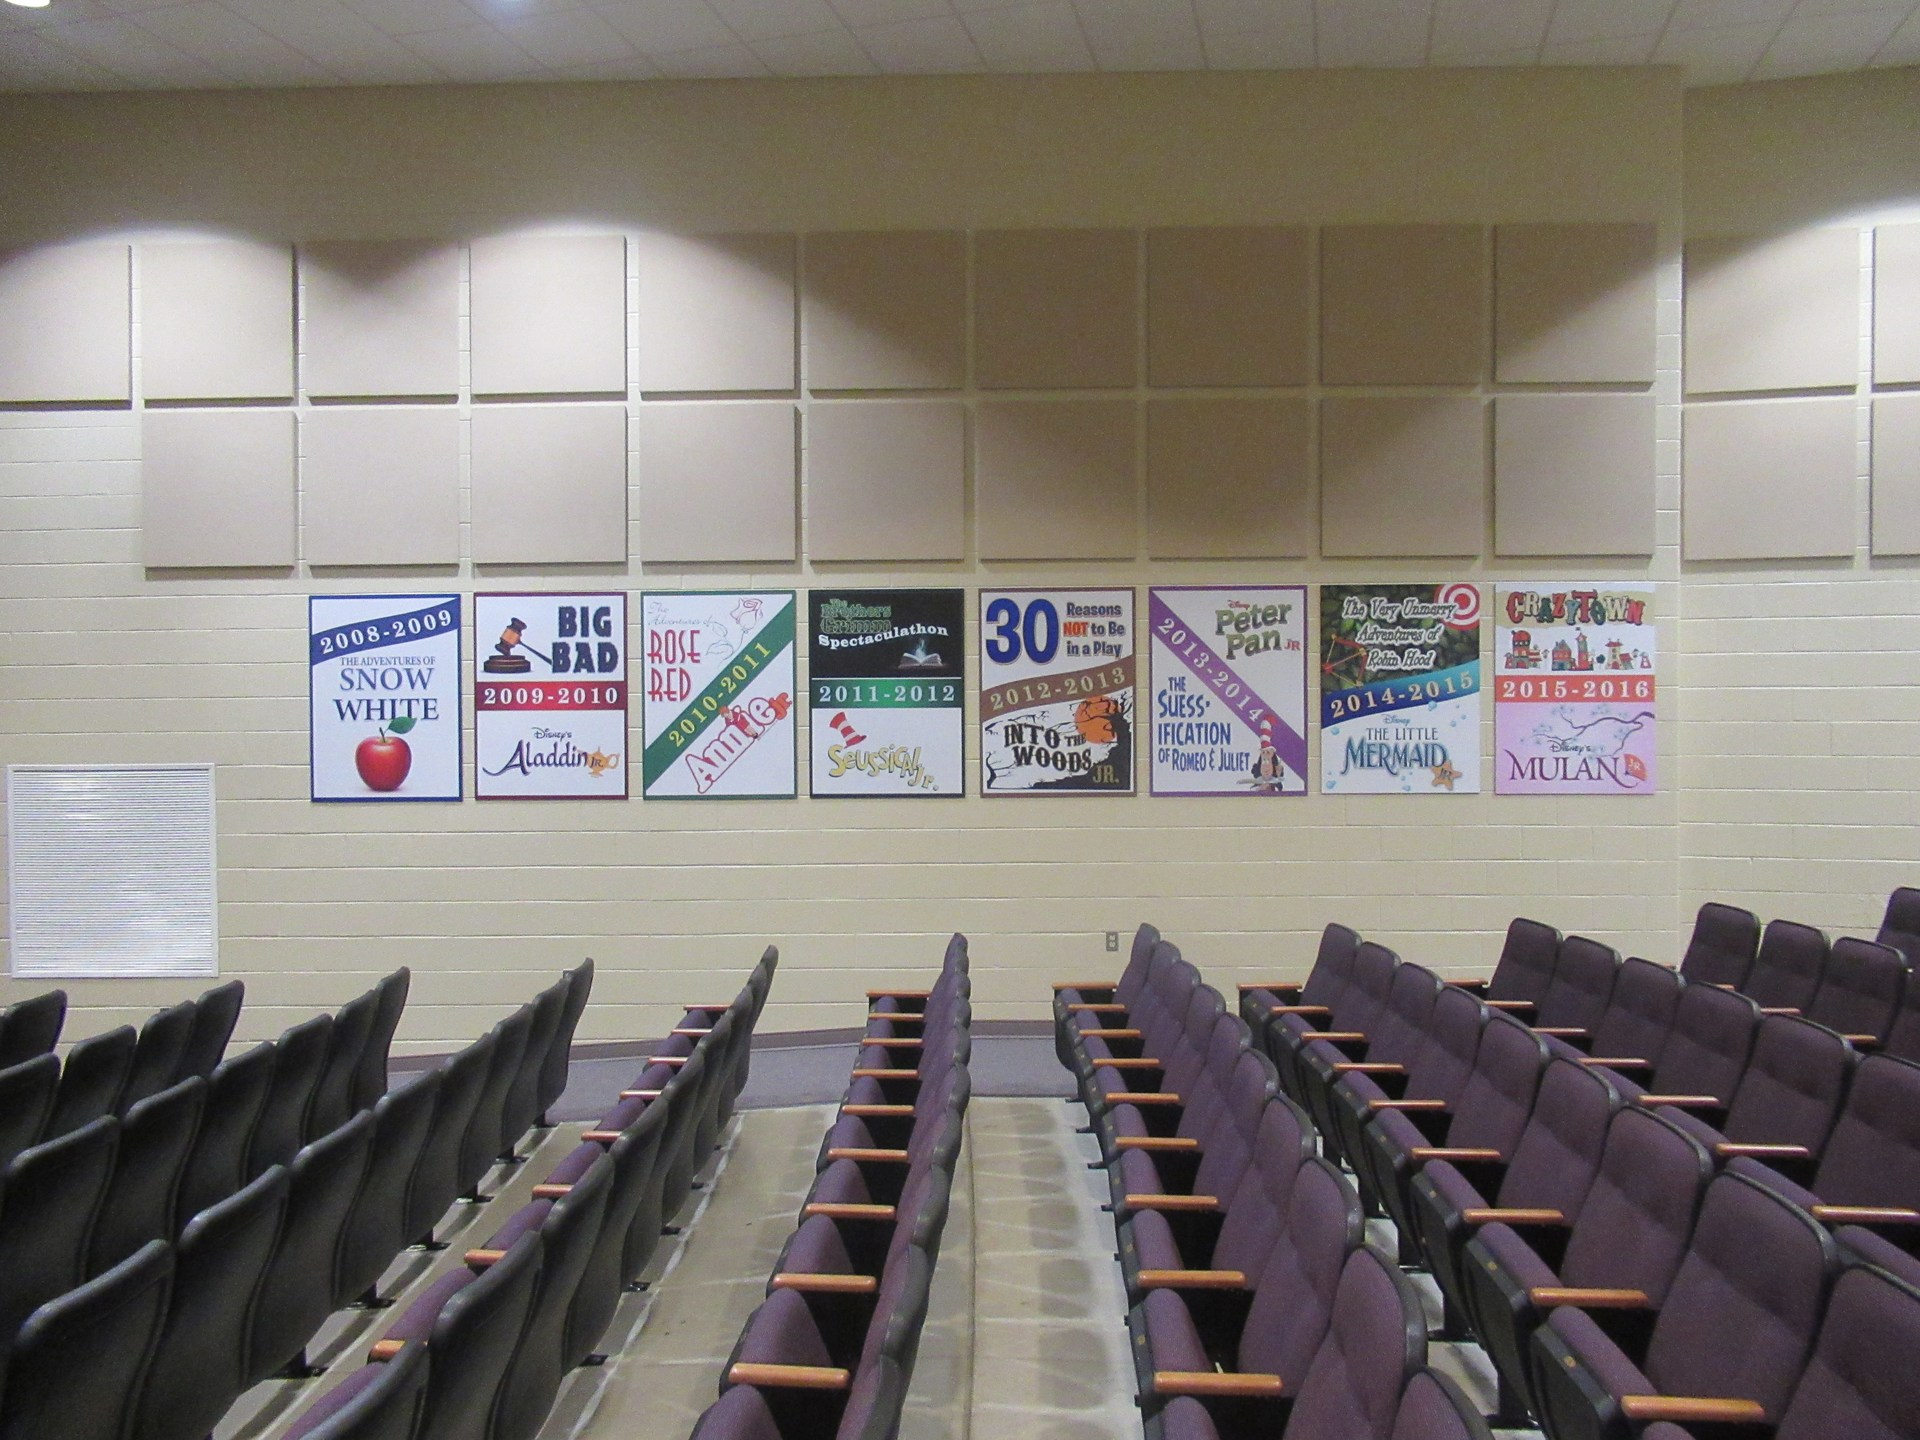 AAJHS Auditorium Previous Preformances